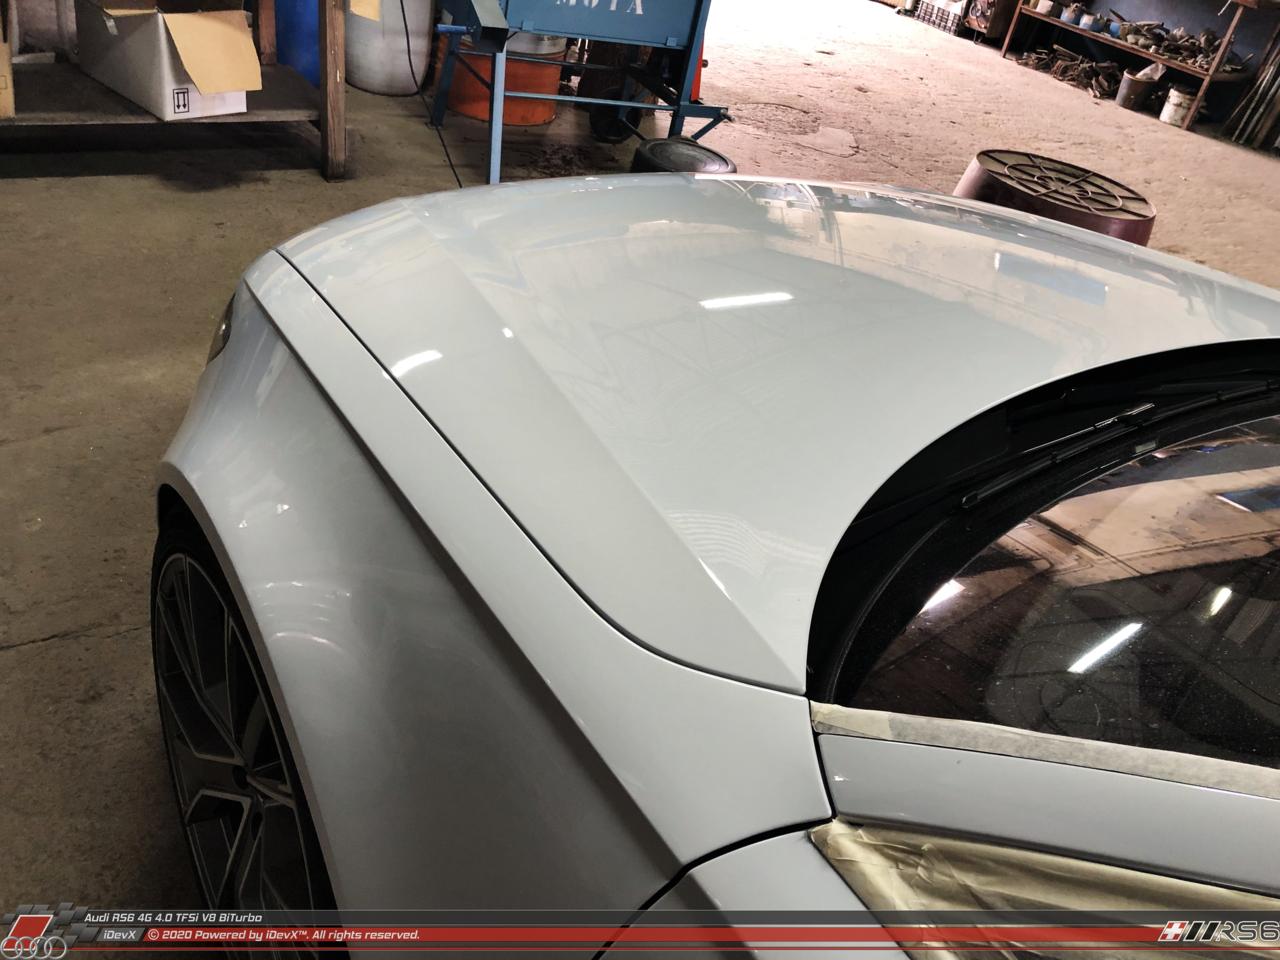 05_08.2019_Audi-RS6_iDevX_026.png